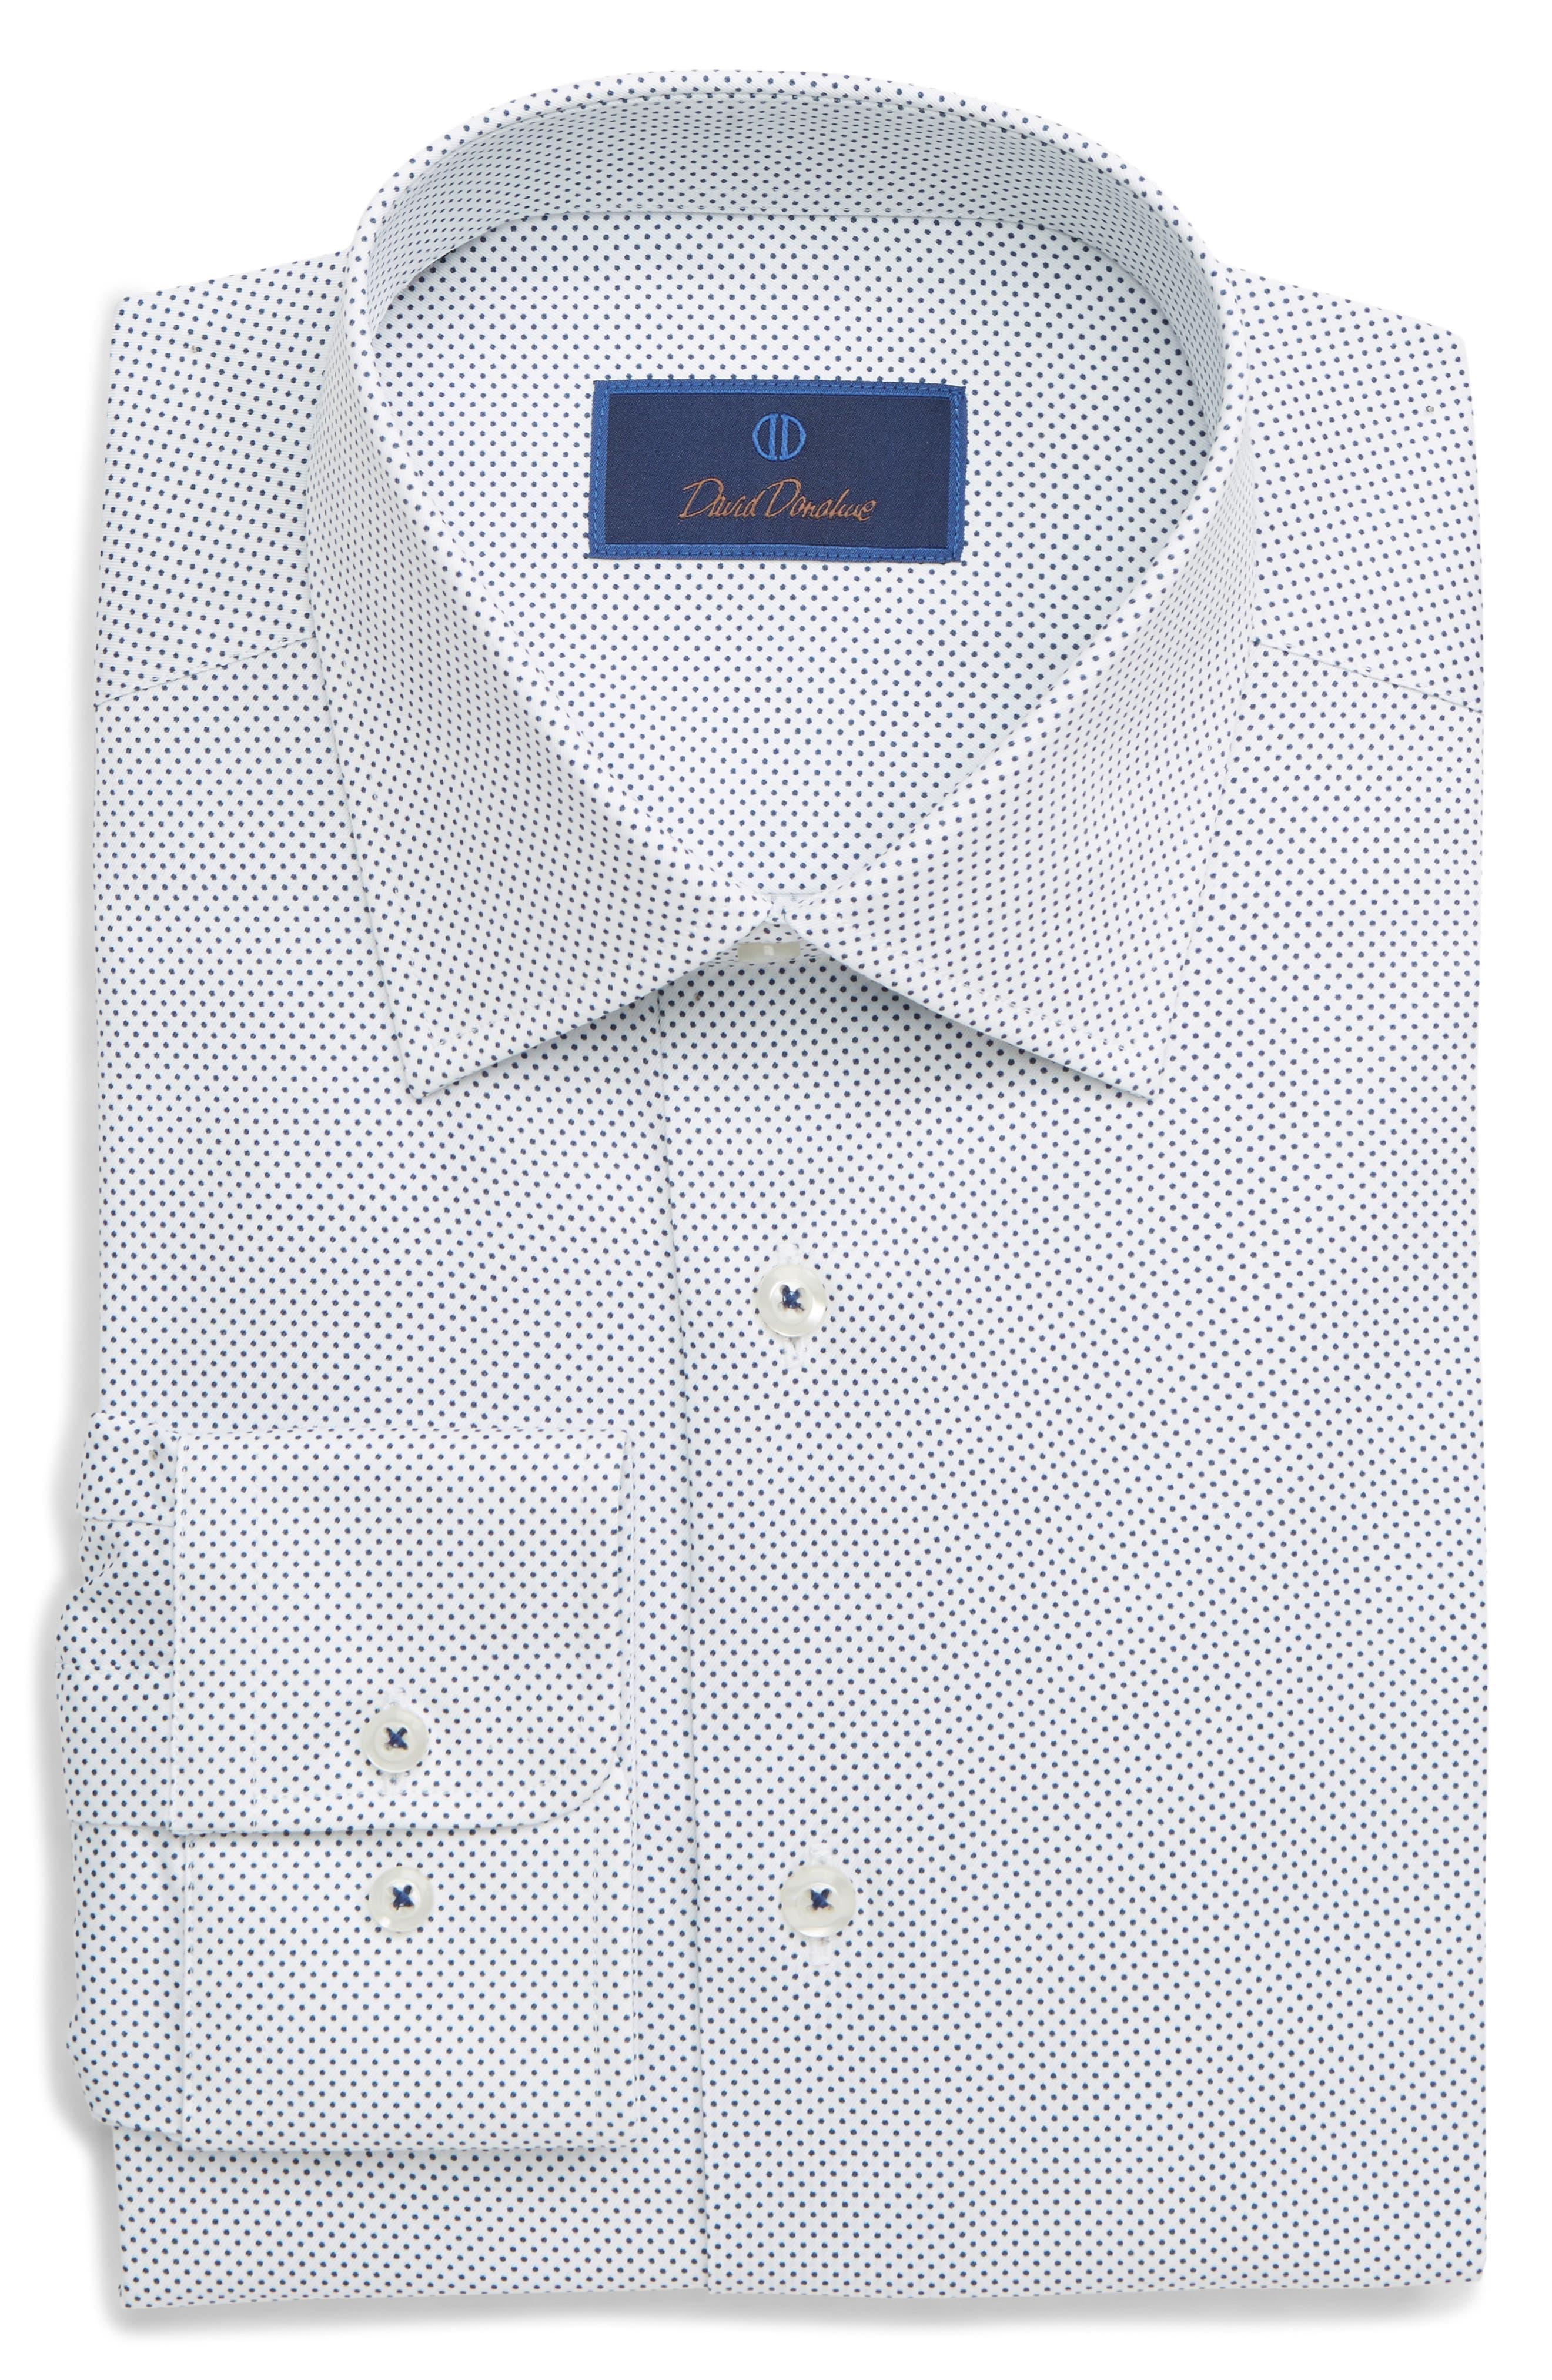 DAVID DONAHUE Regular Fit Dot Dress Shirt, Main, color, WHITE/ NAVY